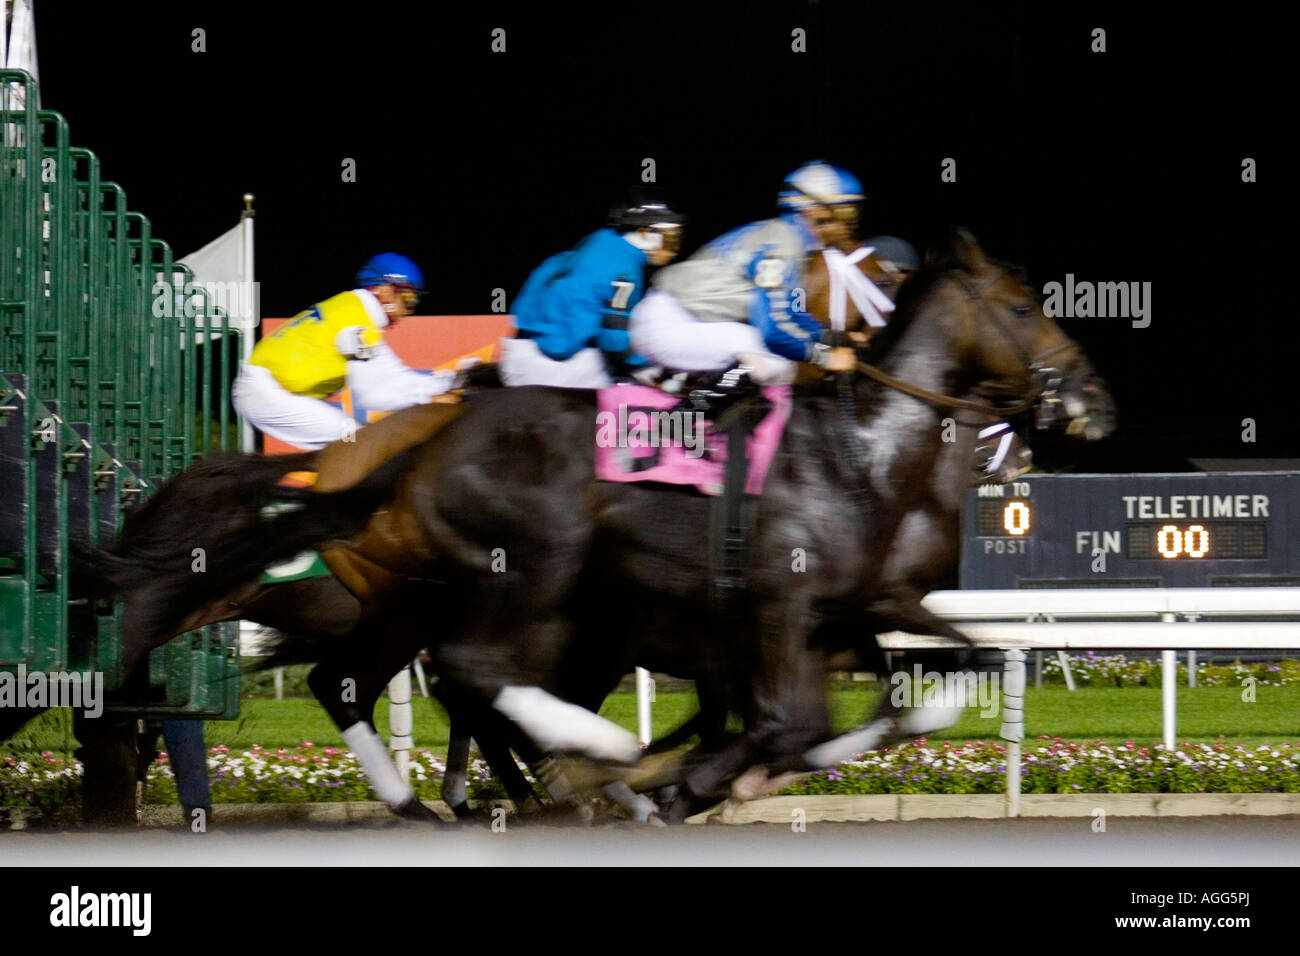 thoroughbred night racing at the starting gate - Stock Image